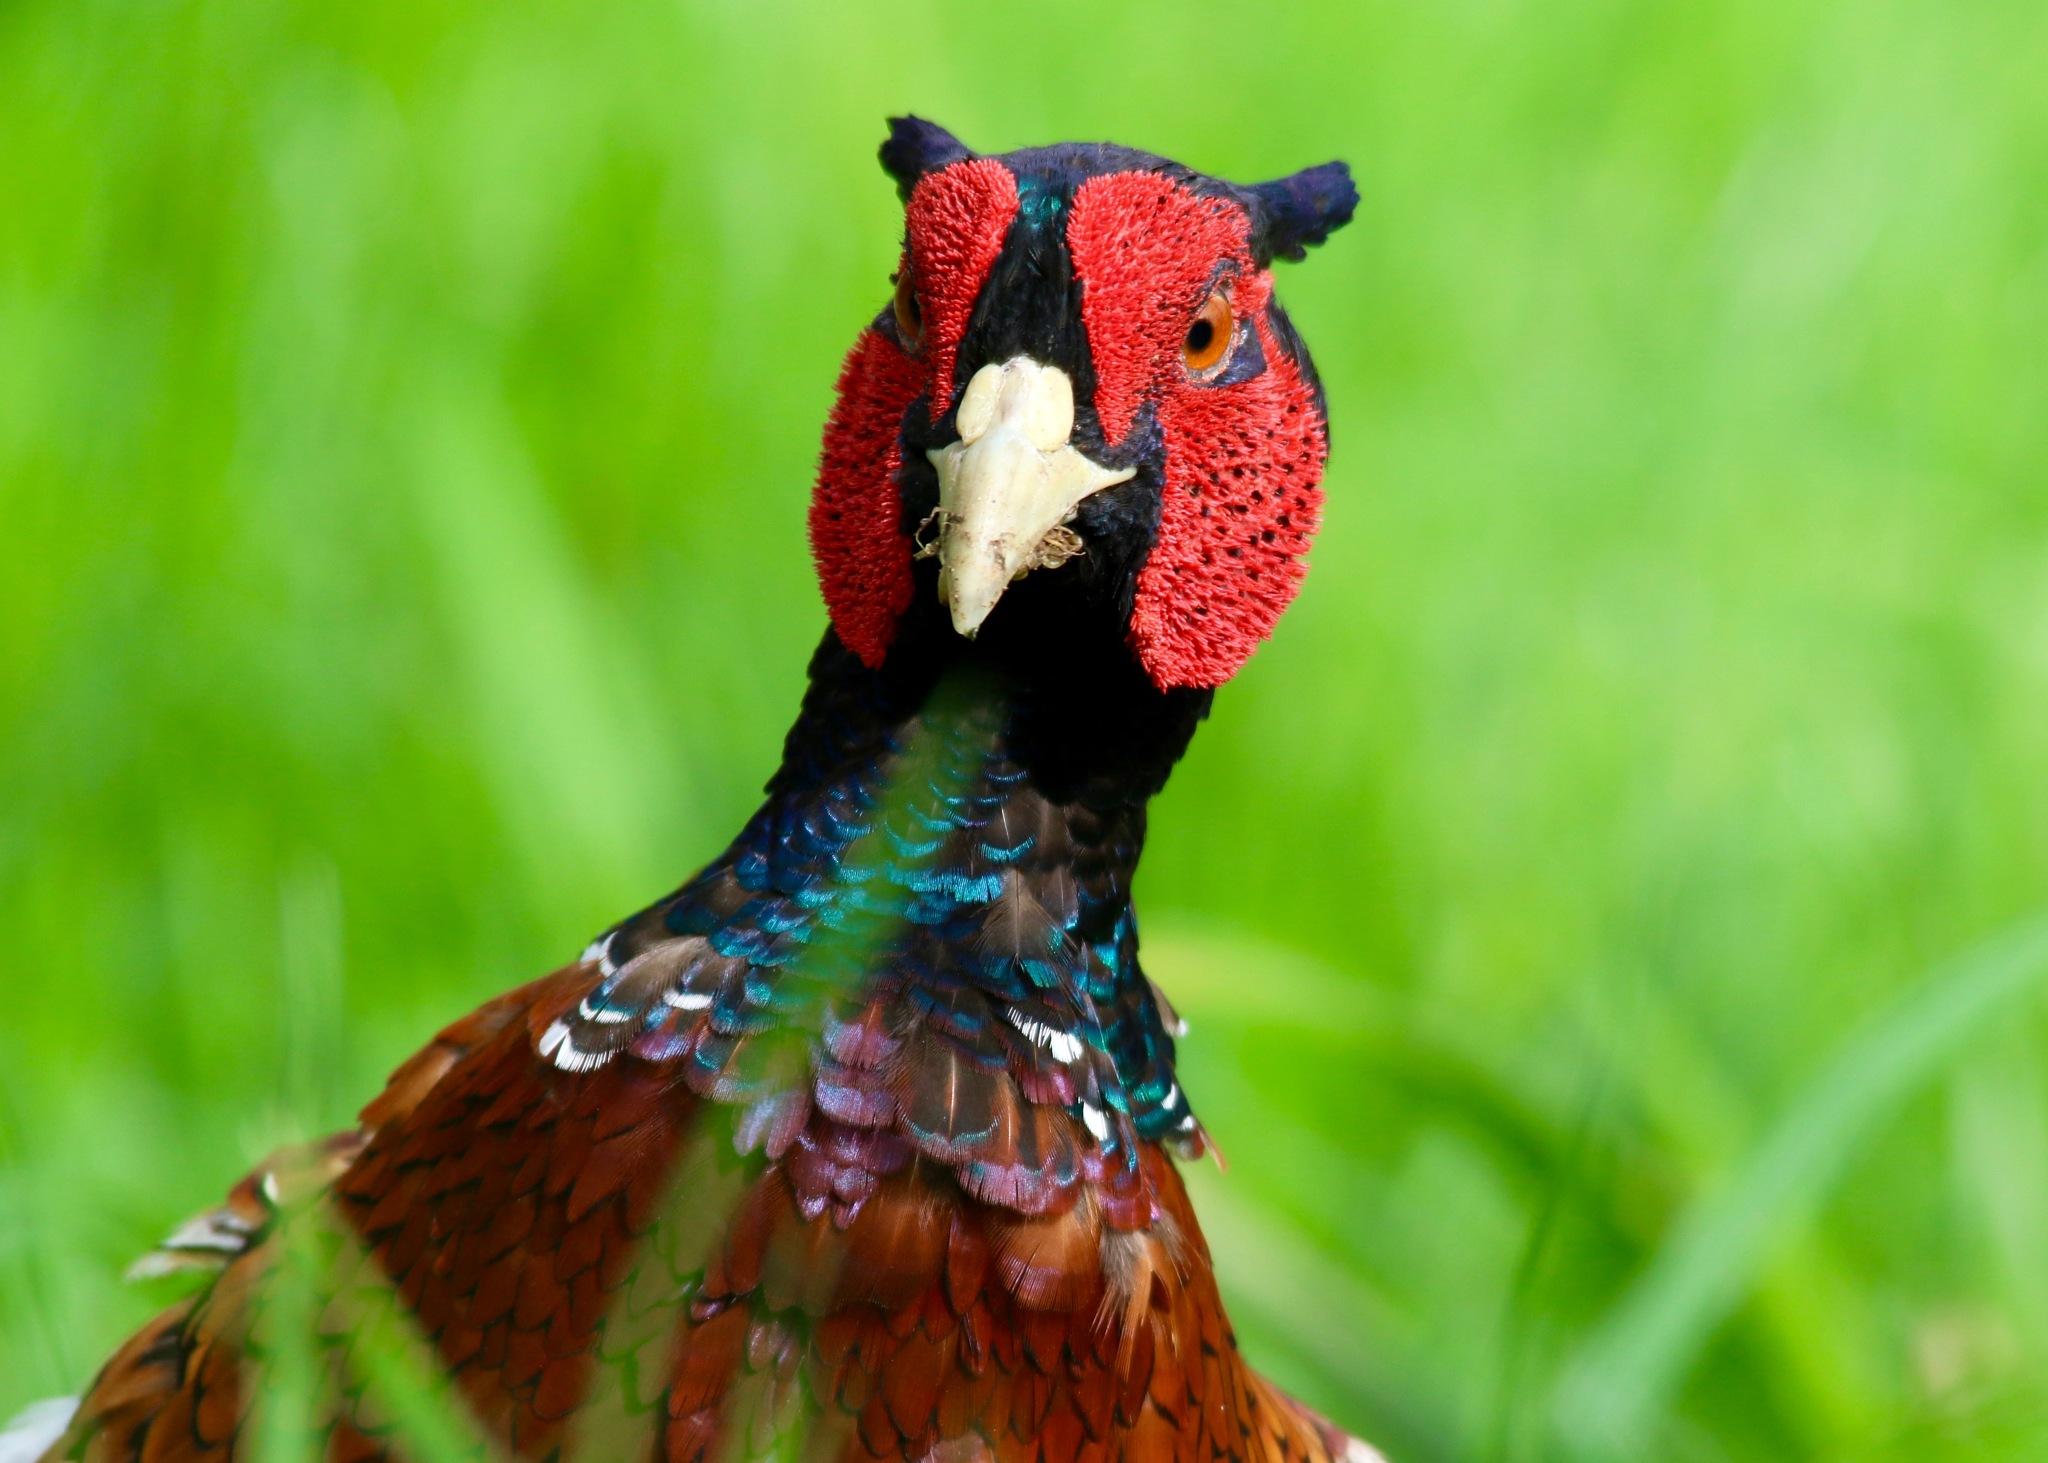 Bird With Attitude by PaulWhiteman